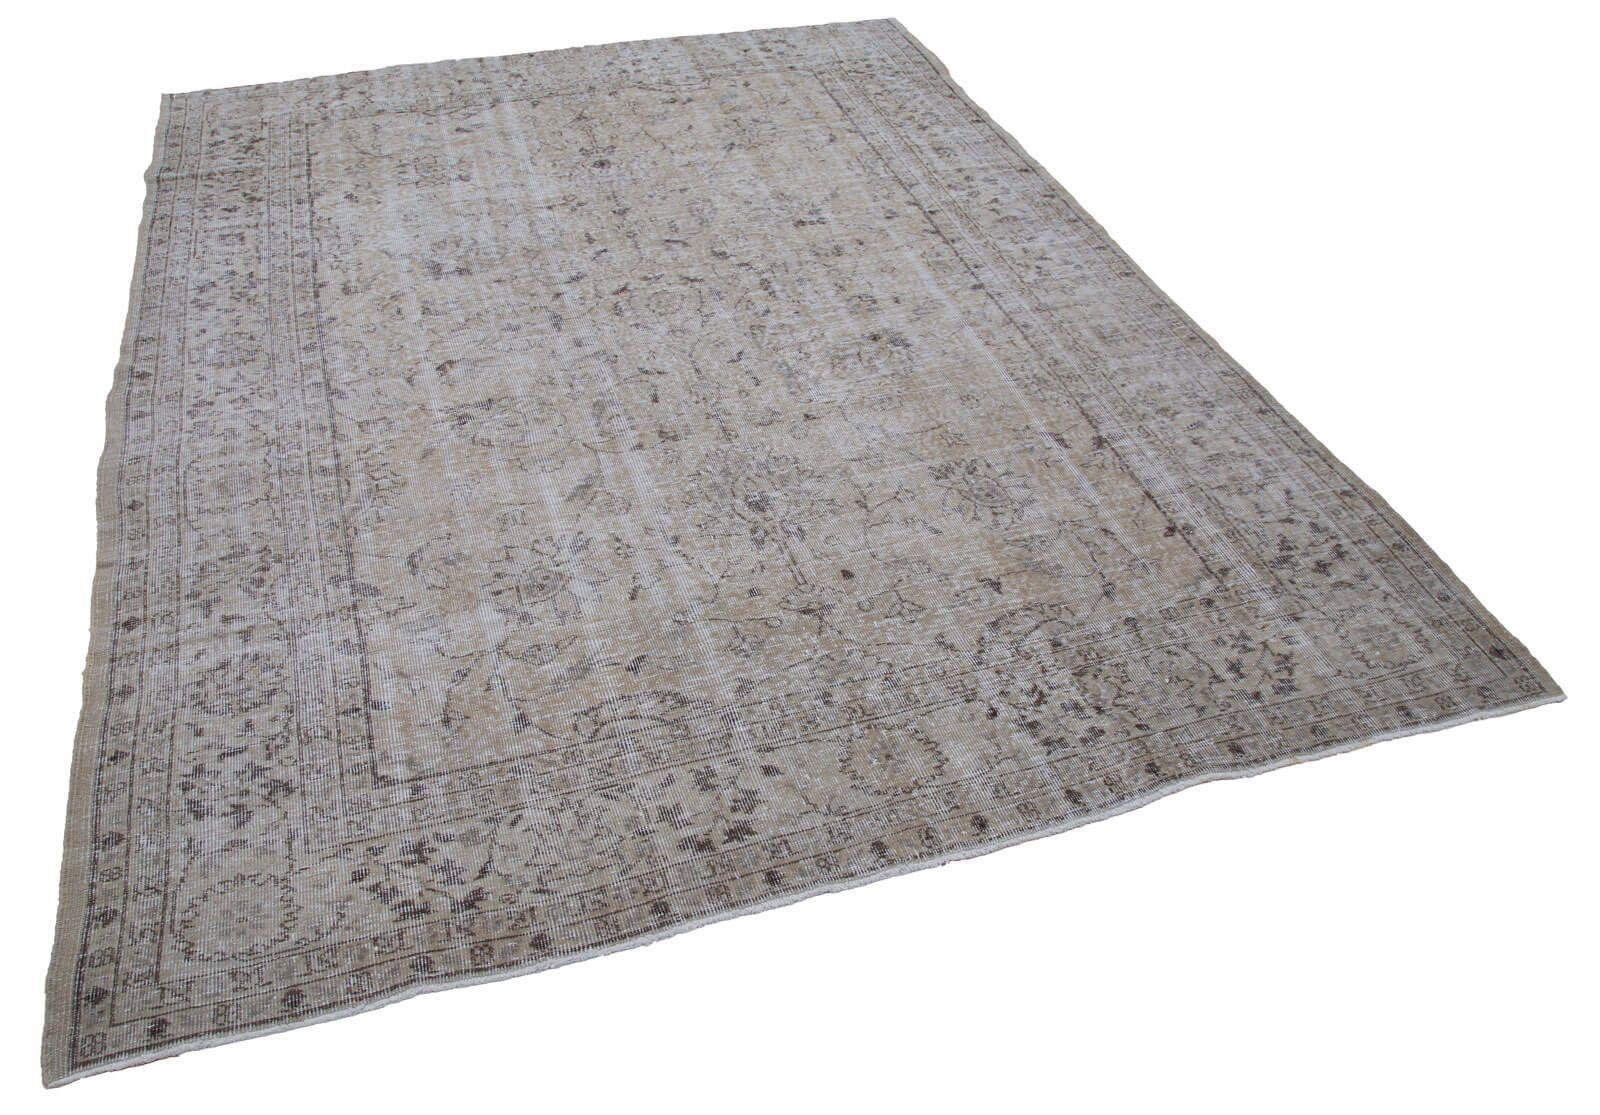 7x9 Vintage Rug Turkish Handmade Contemporary Wool Area Rug